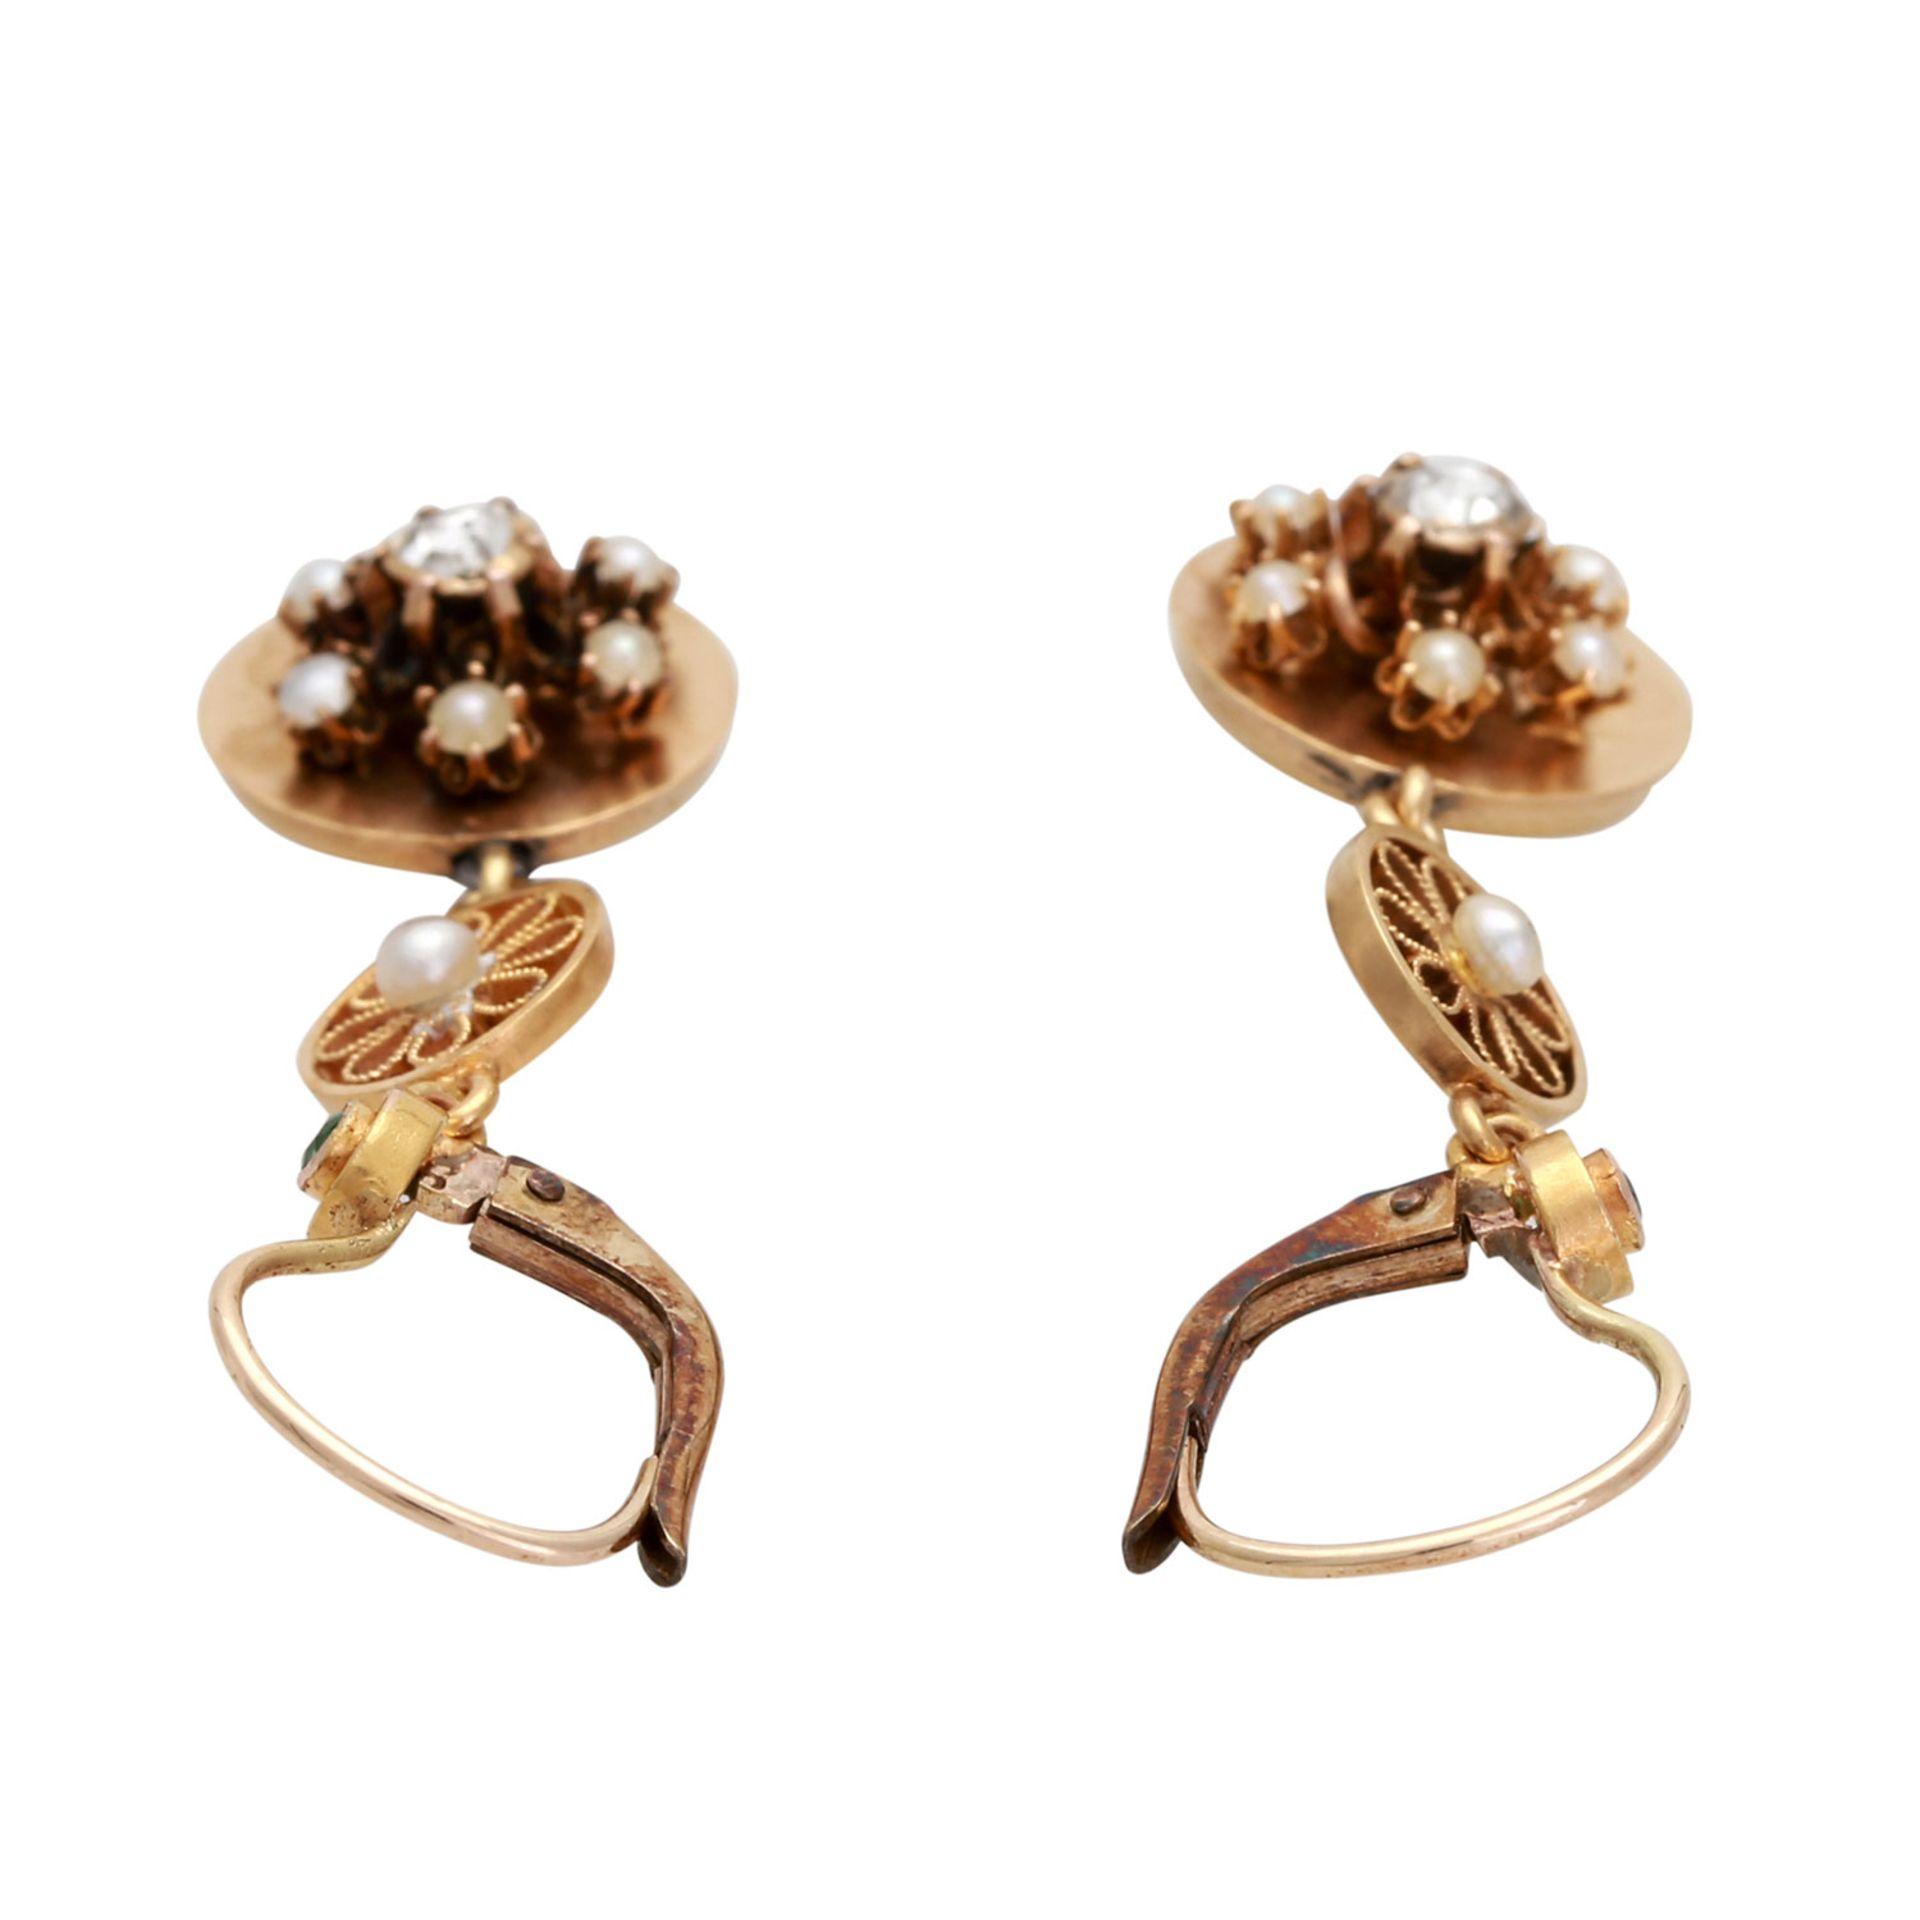 Los 165 - Ohrhänger mit je 1 Diamantrose, 1 Smaragd und 1 Perle, sowie 6 Halbperlen, Roségold 14K, filigrane